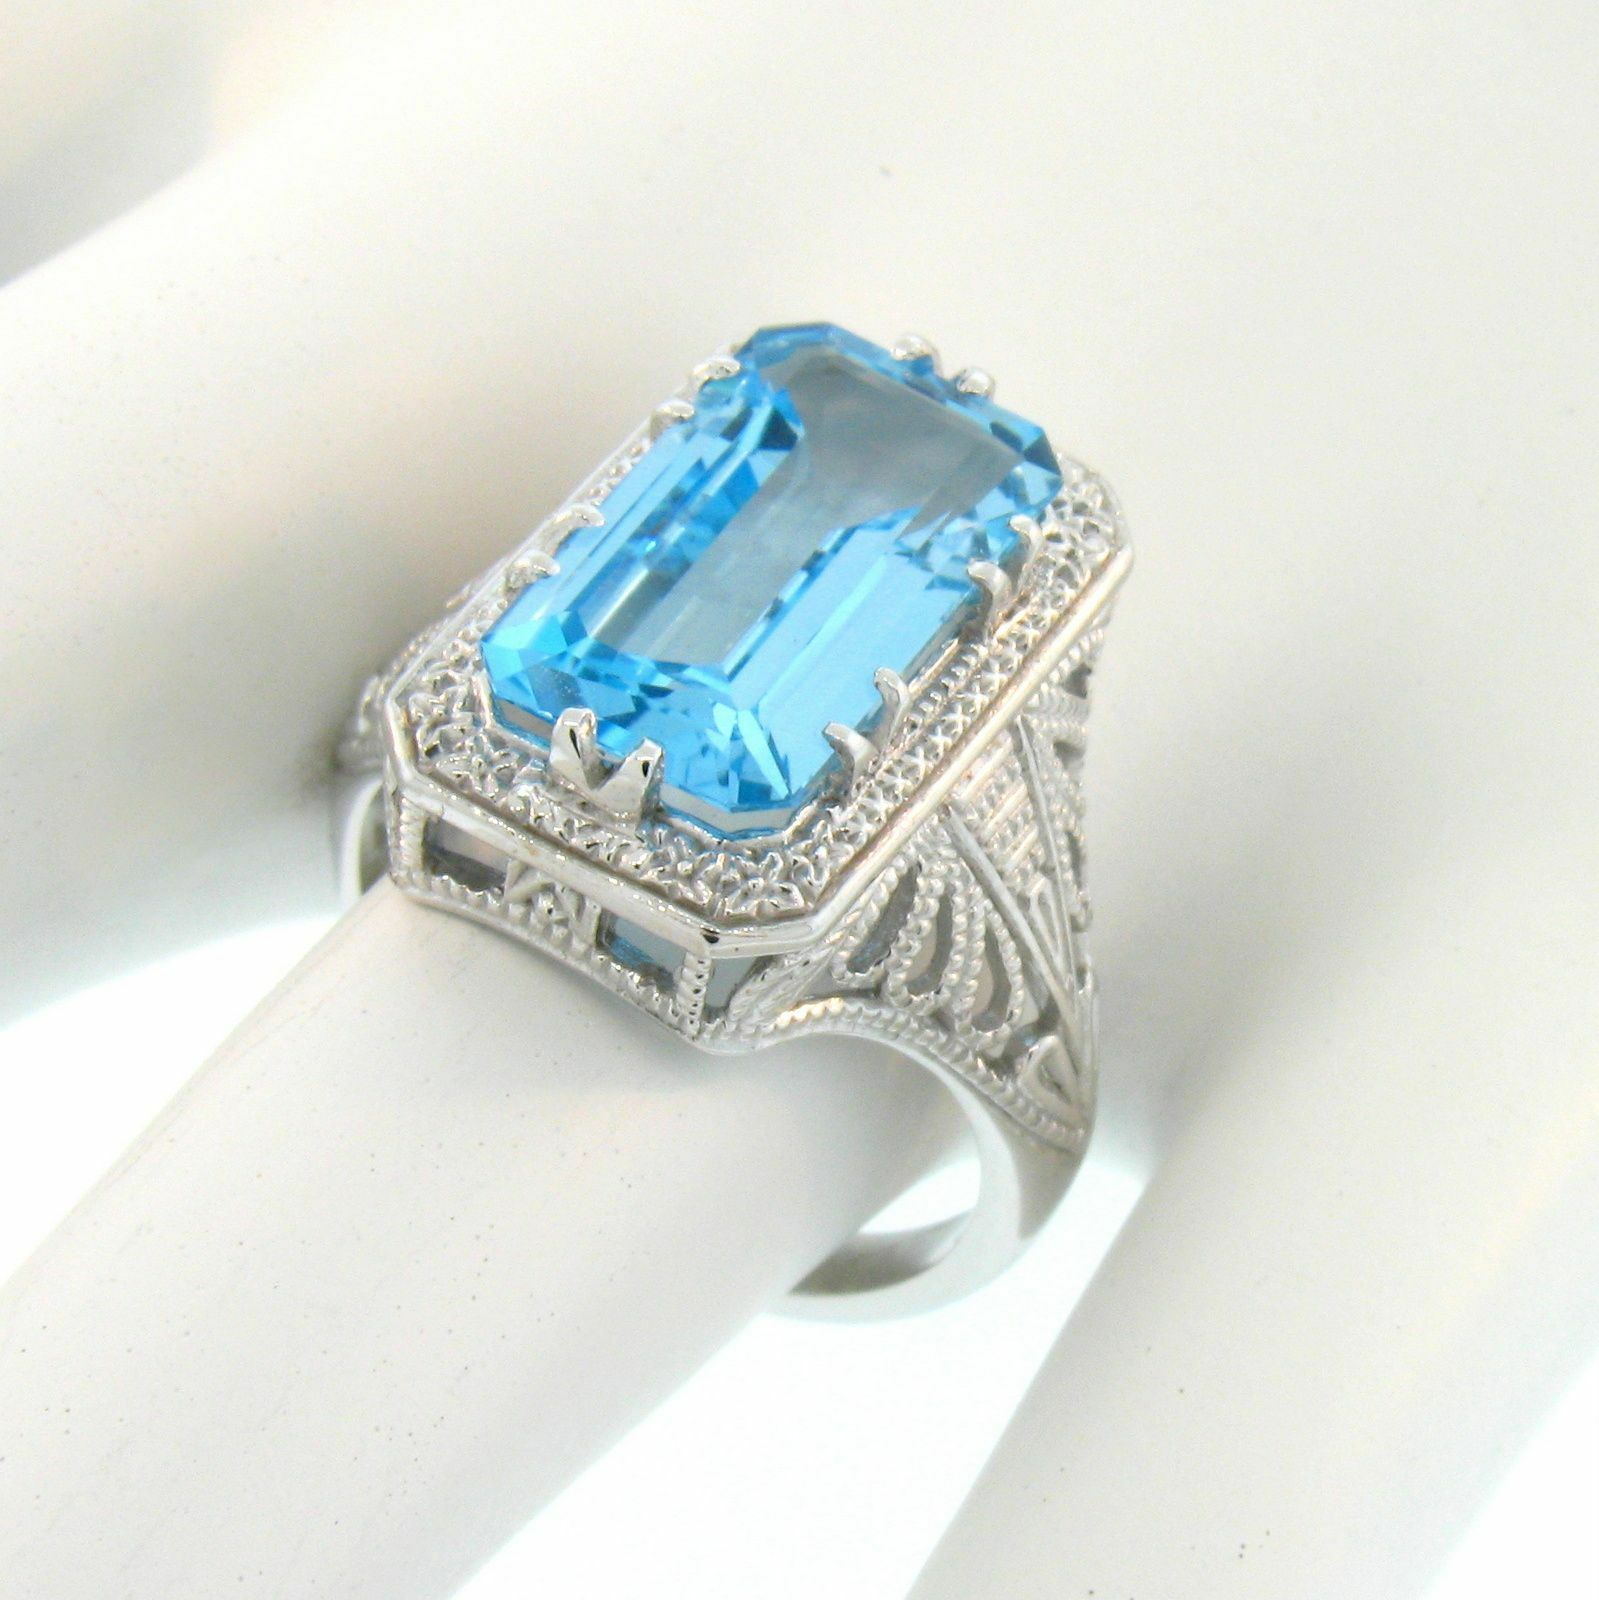 10K WHITE gold GENUINE SWISS blueeE TOPAZ ANTIQUE DESIGN RING SIZE 9,          A52